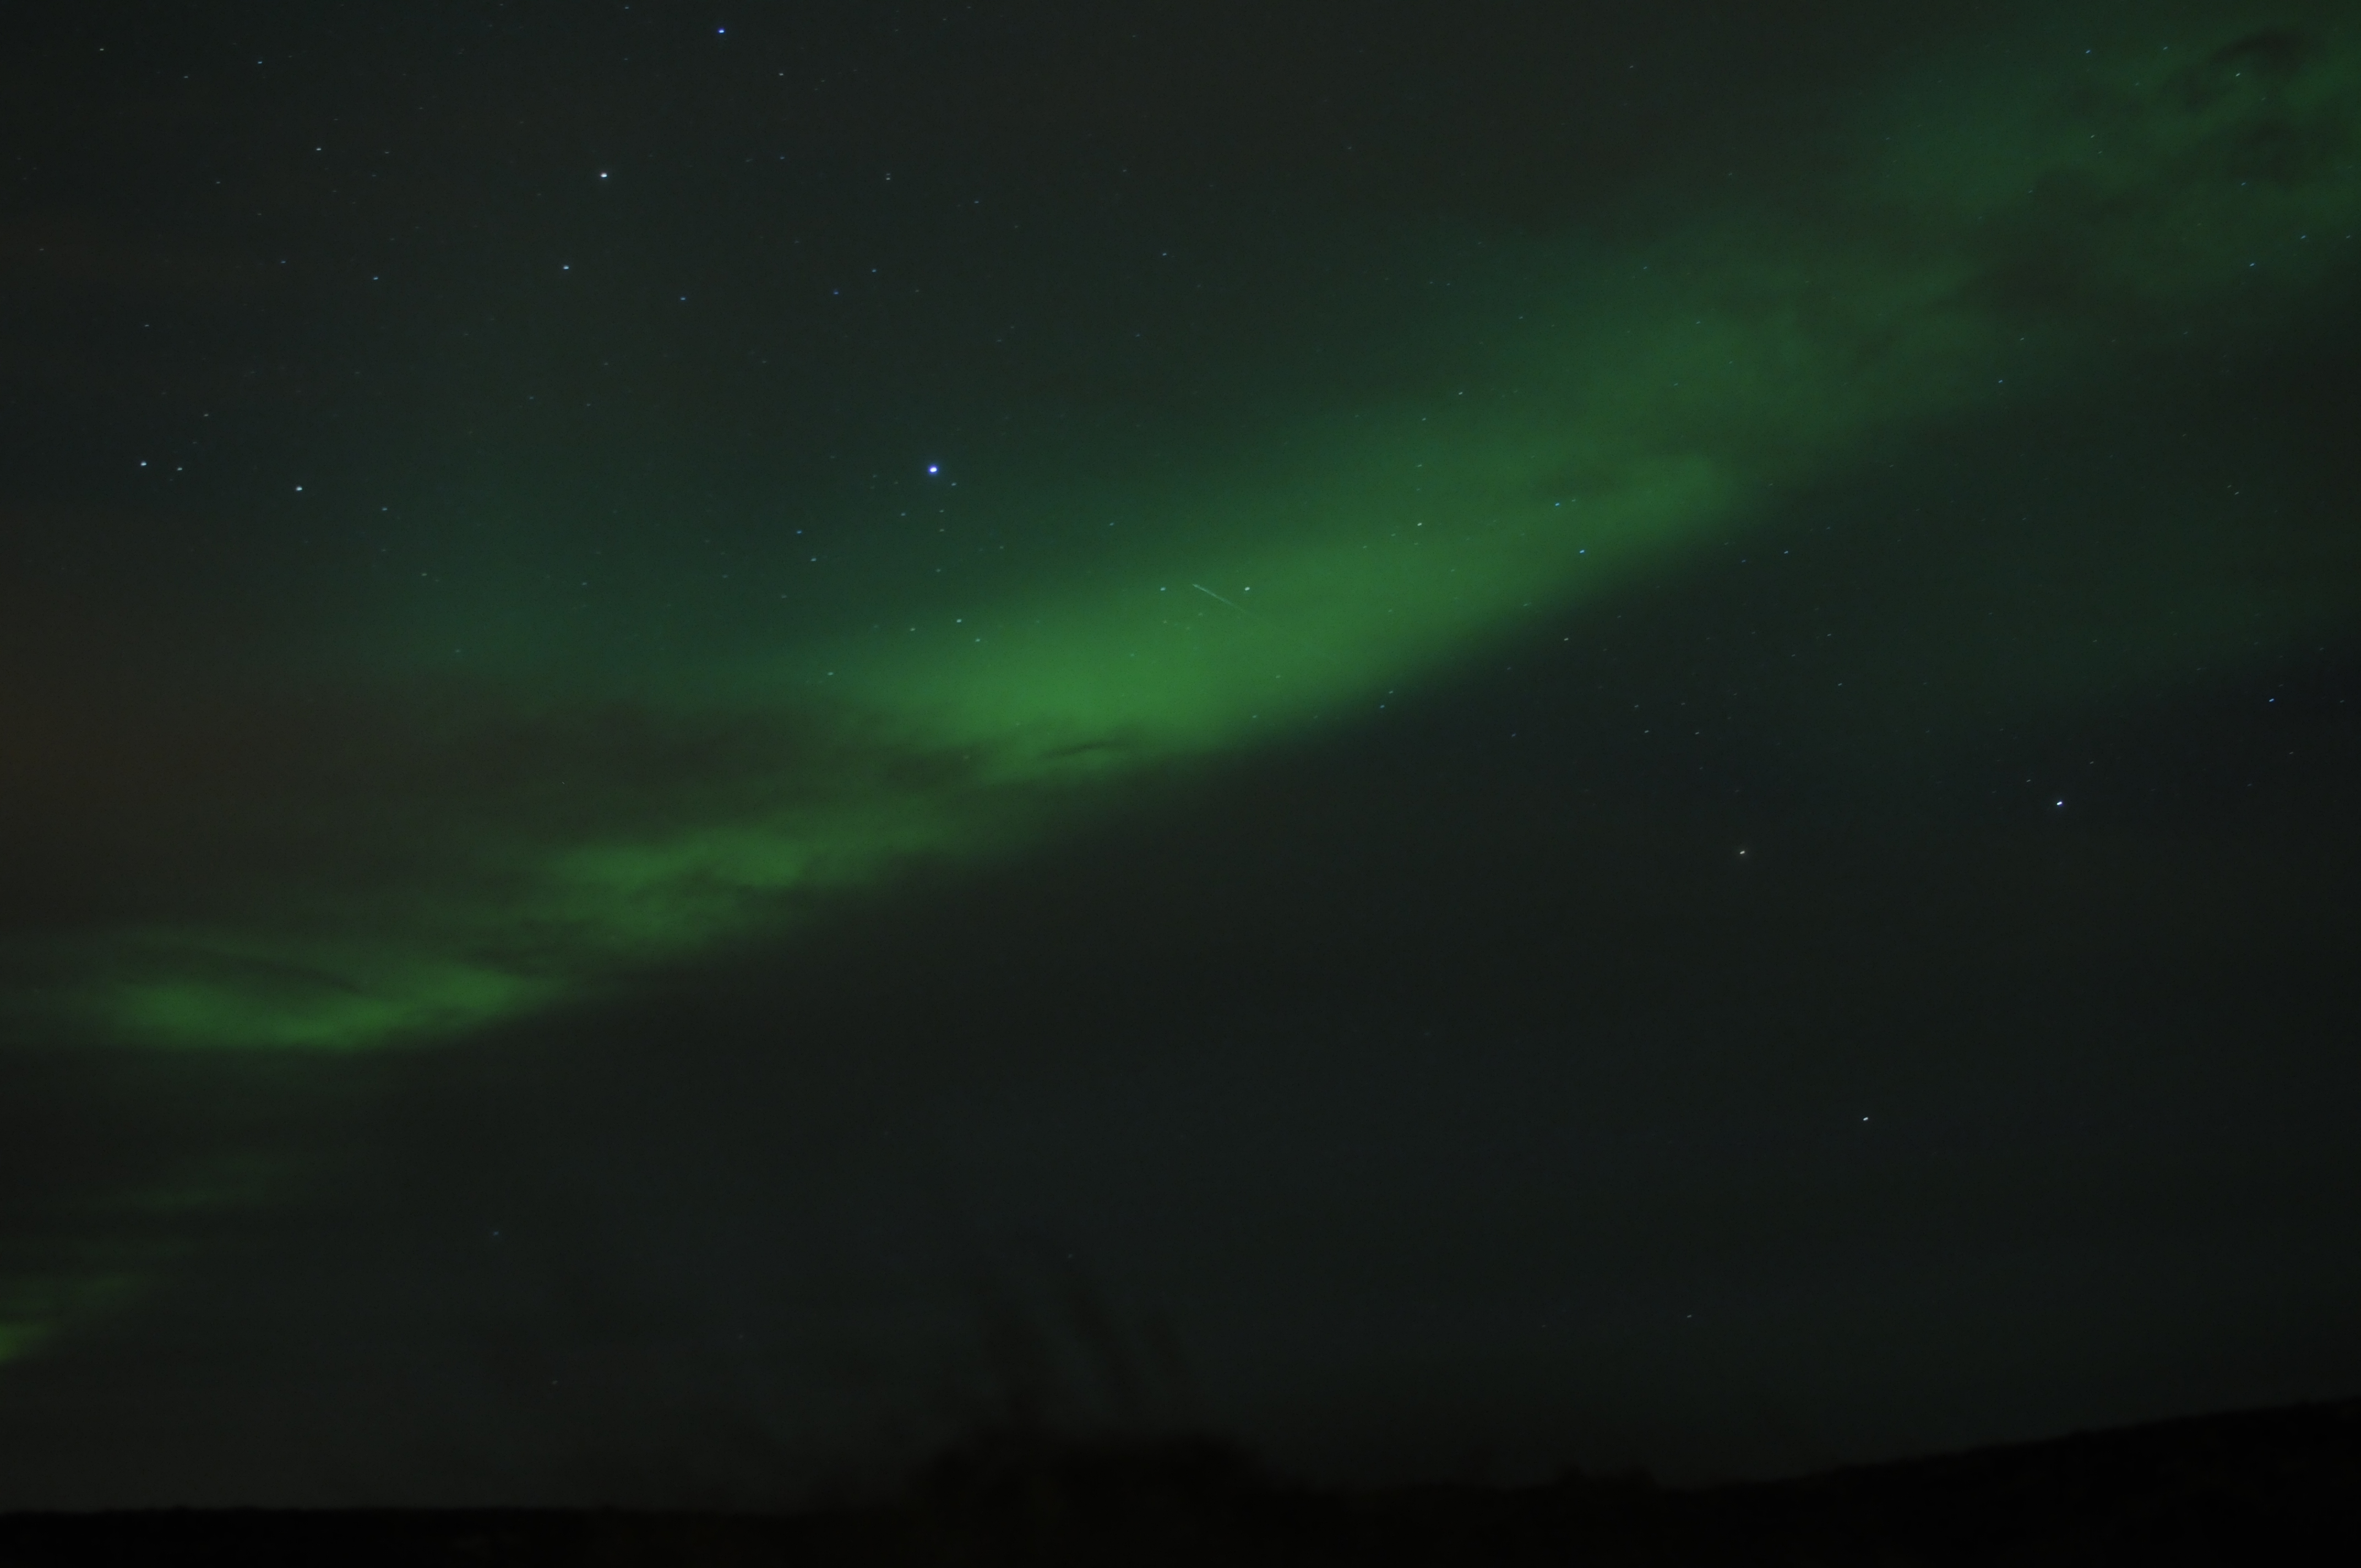 northern lights comet - photo #19